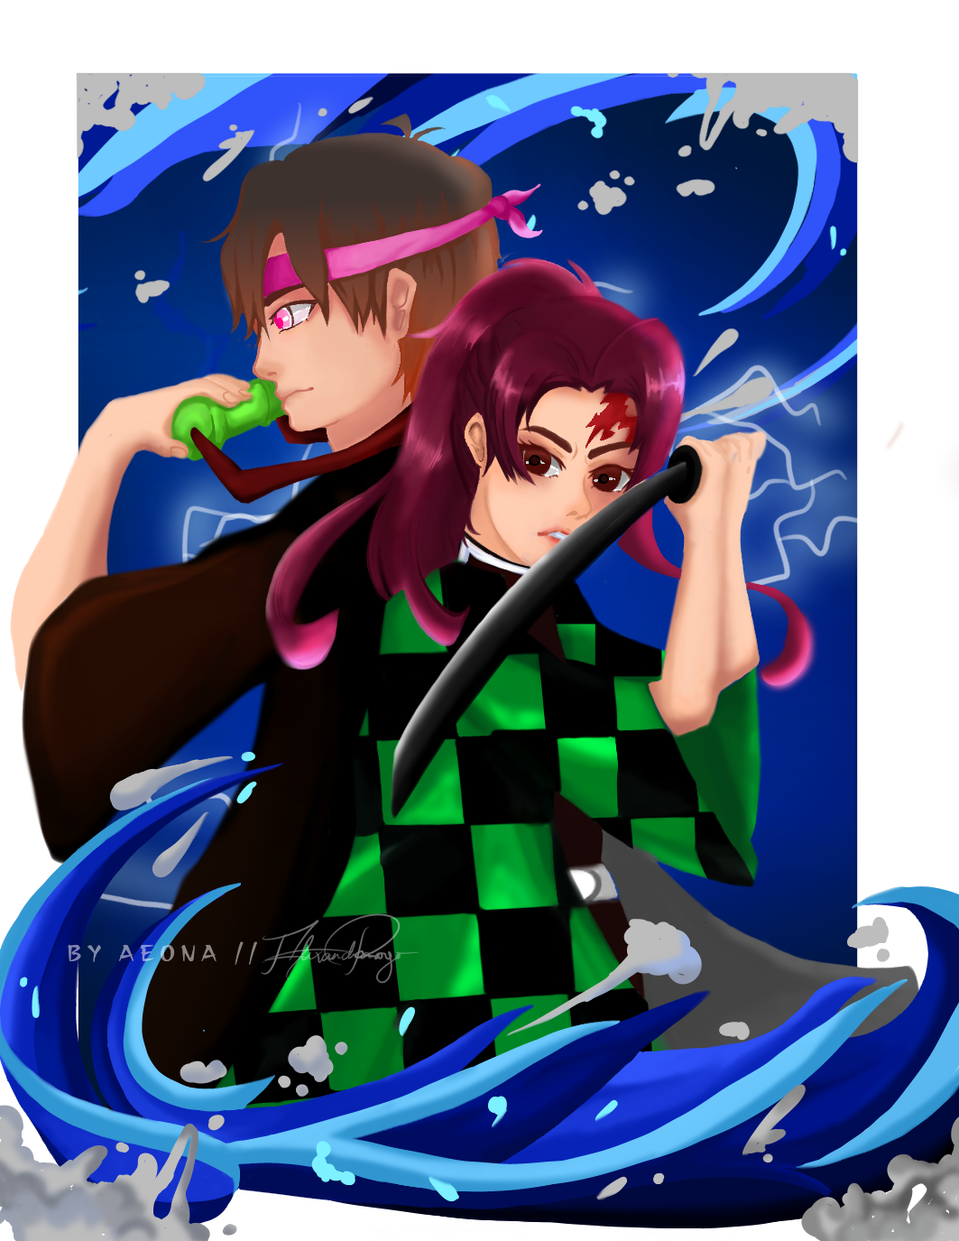 Gender swap: Tanjiro and Nezuko Illust of Aeona DemonSlayerFanartContest anime painting KamadoTanjirou KimetsunoYaiba medibangpaint fanart KamadoNezuko Genderbend